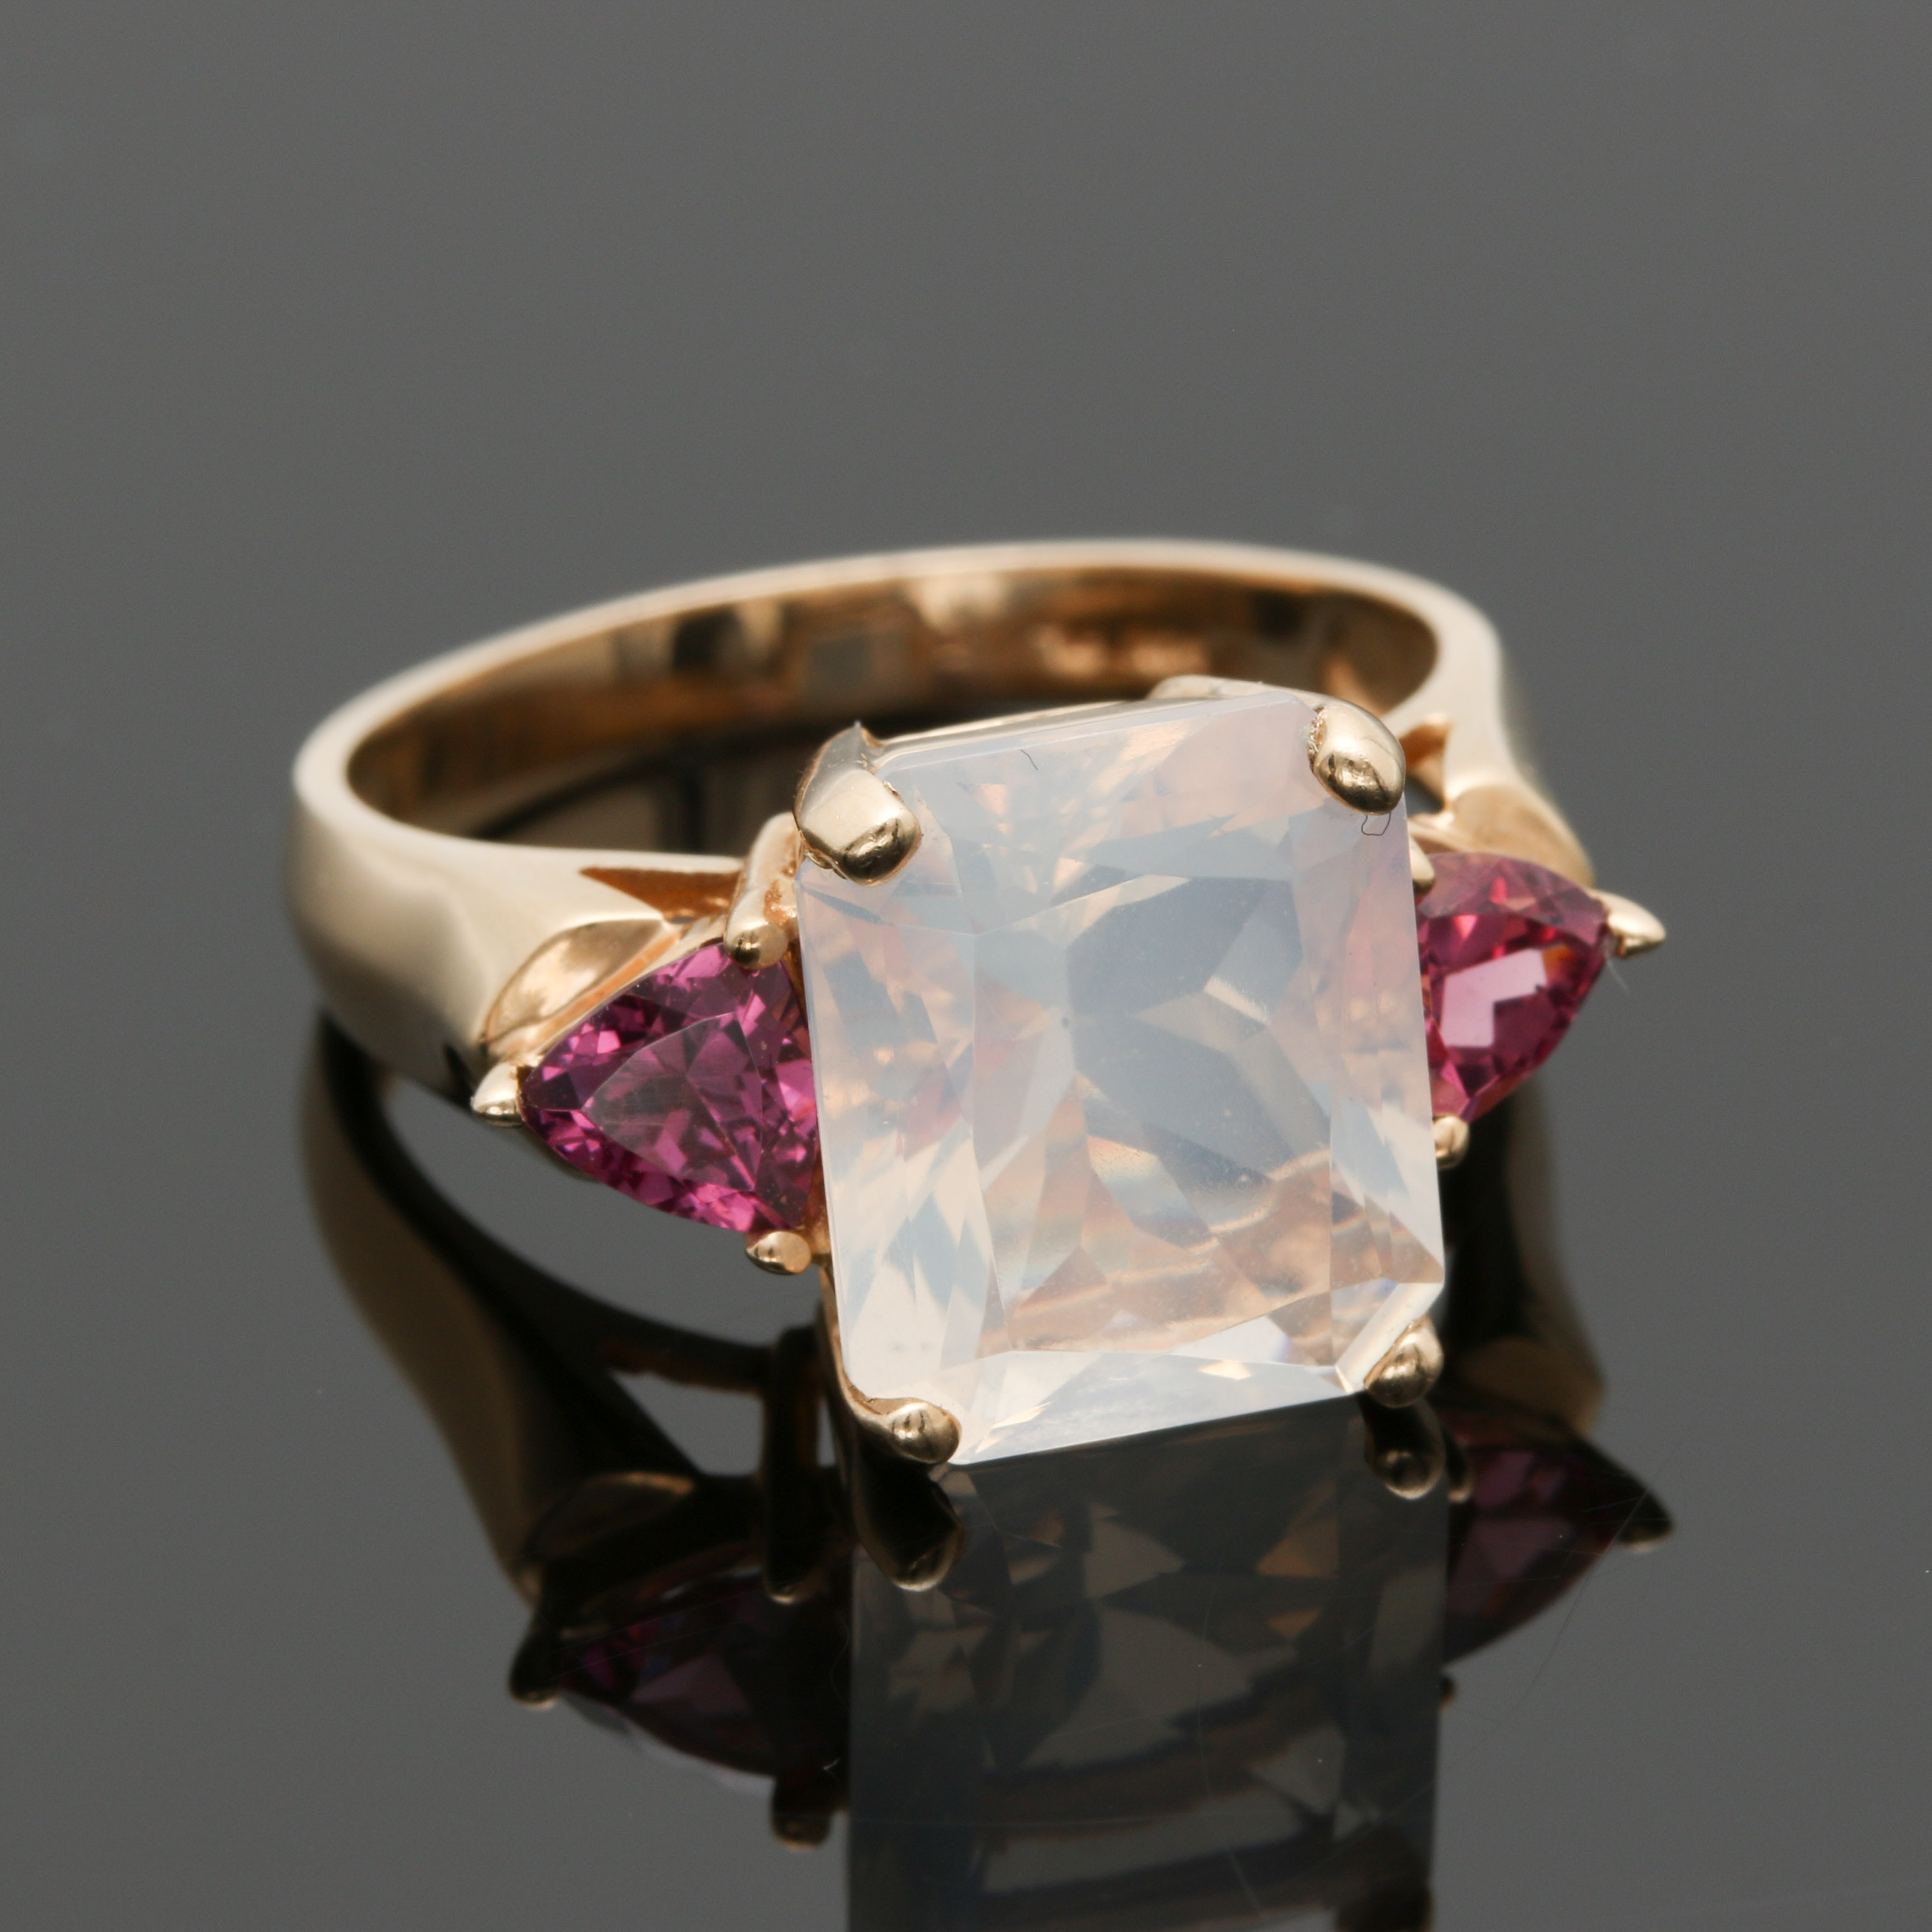 14K Yellow Gold Moostone and Rhodolite Garnet Ring